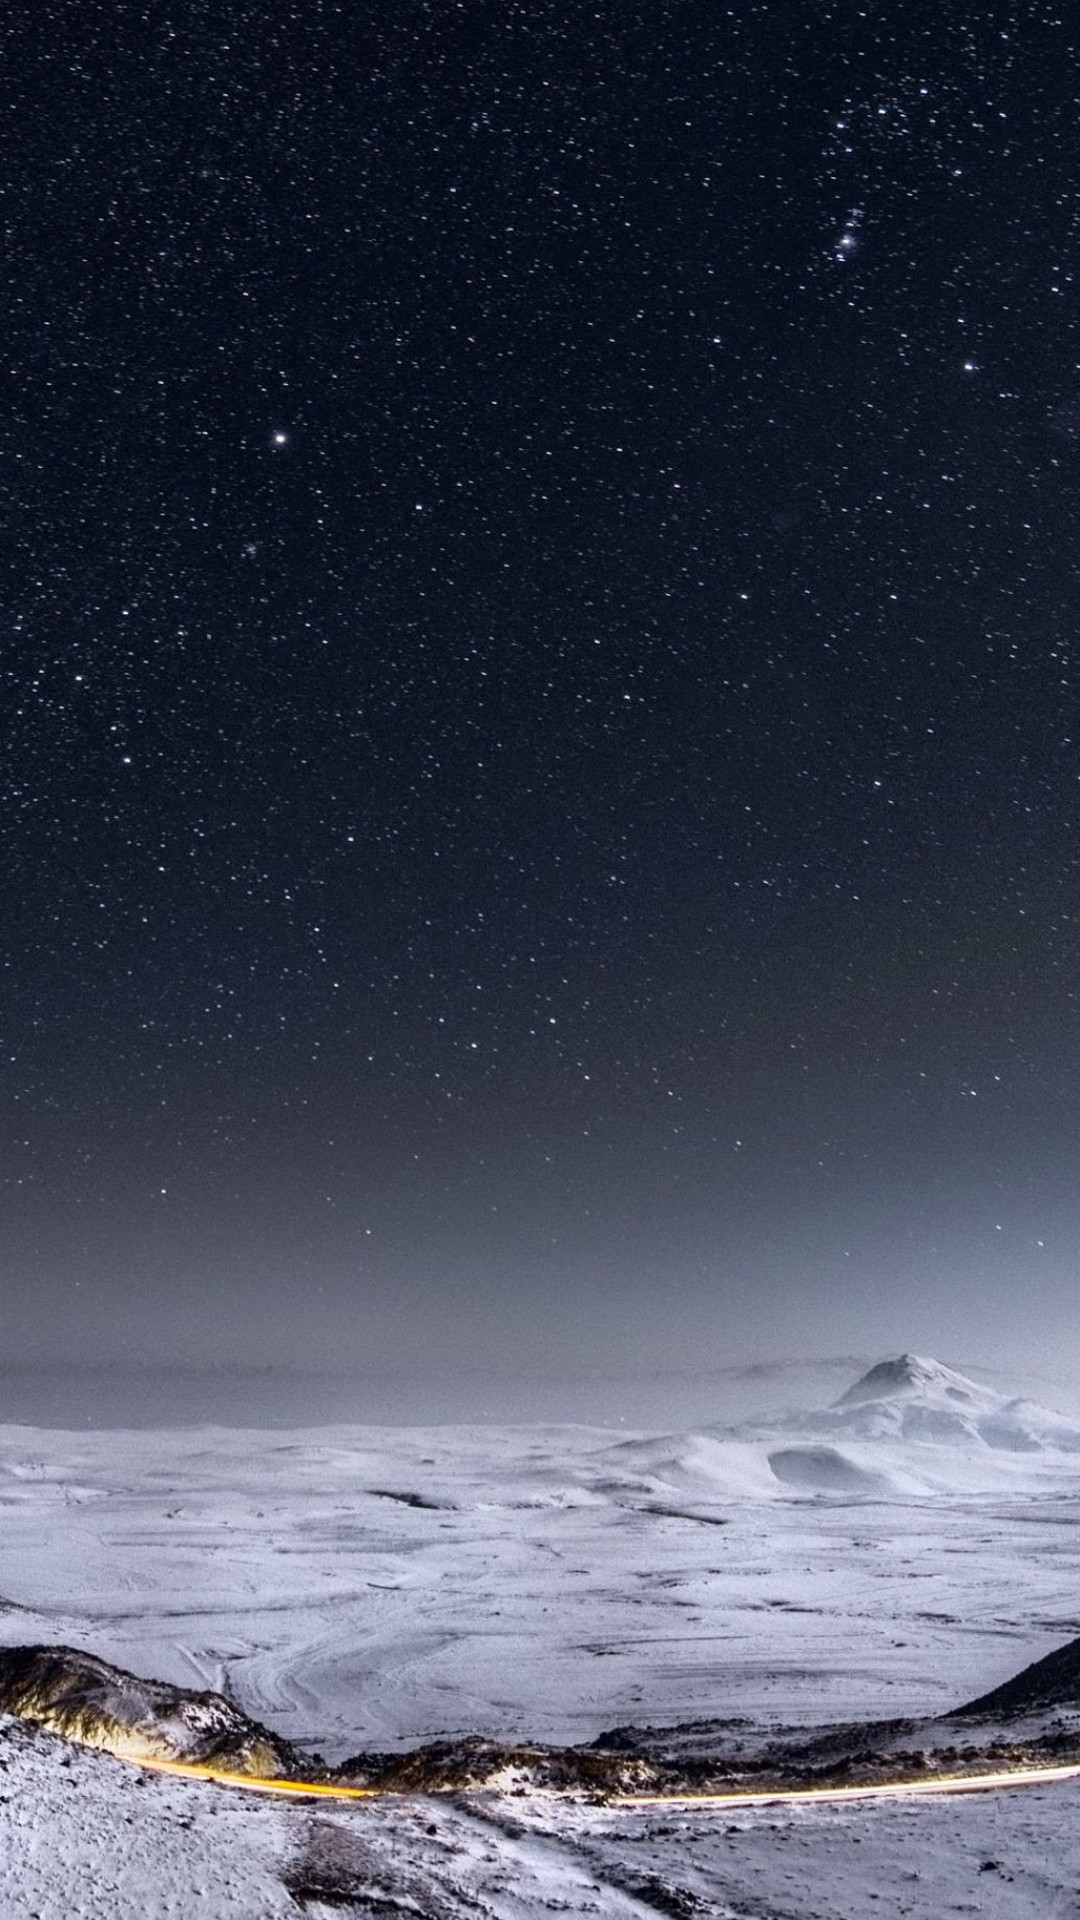 Scenic Lake Fog Mist Moon Eclipse iOS 8 #iPhone 5 #Wallpaper | iPhone  Wallpapers | Pinterest | iOS, Wallpaper and Moon